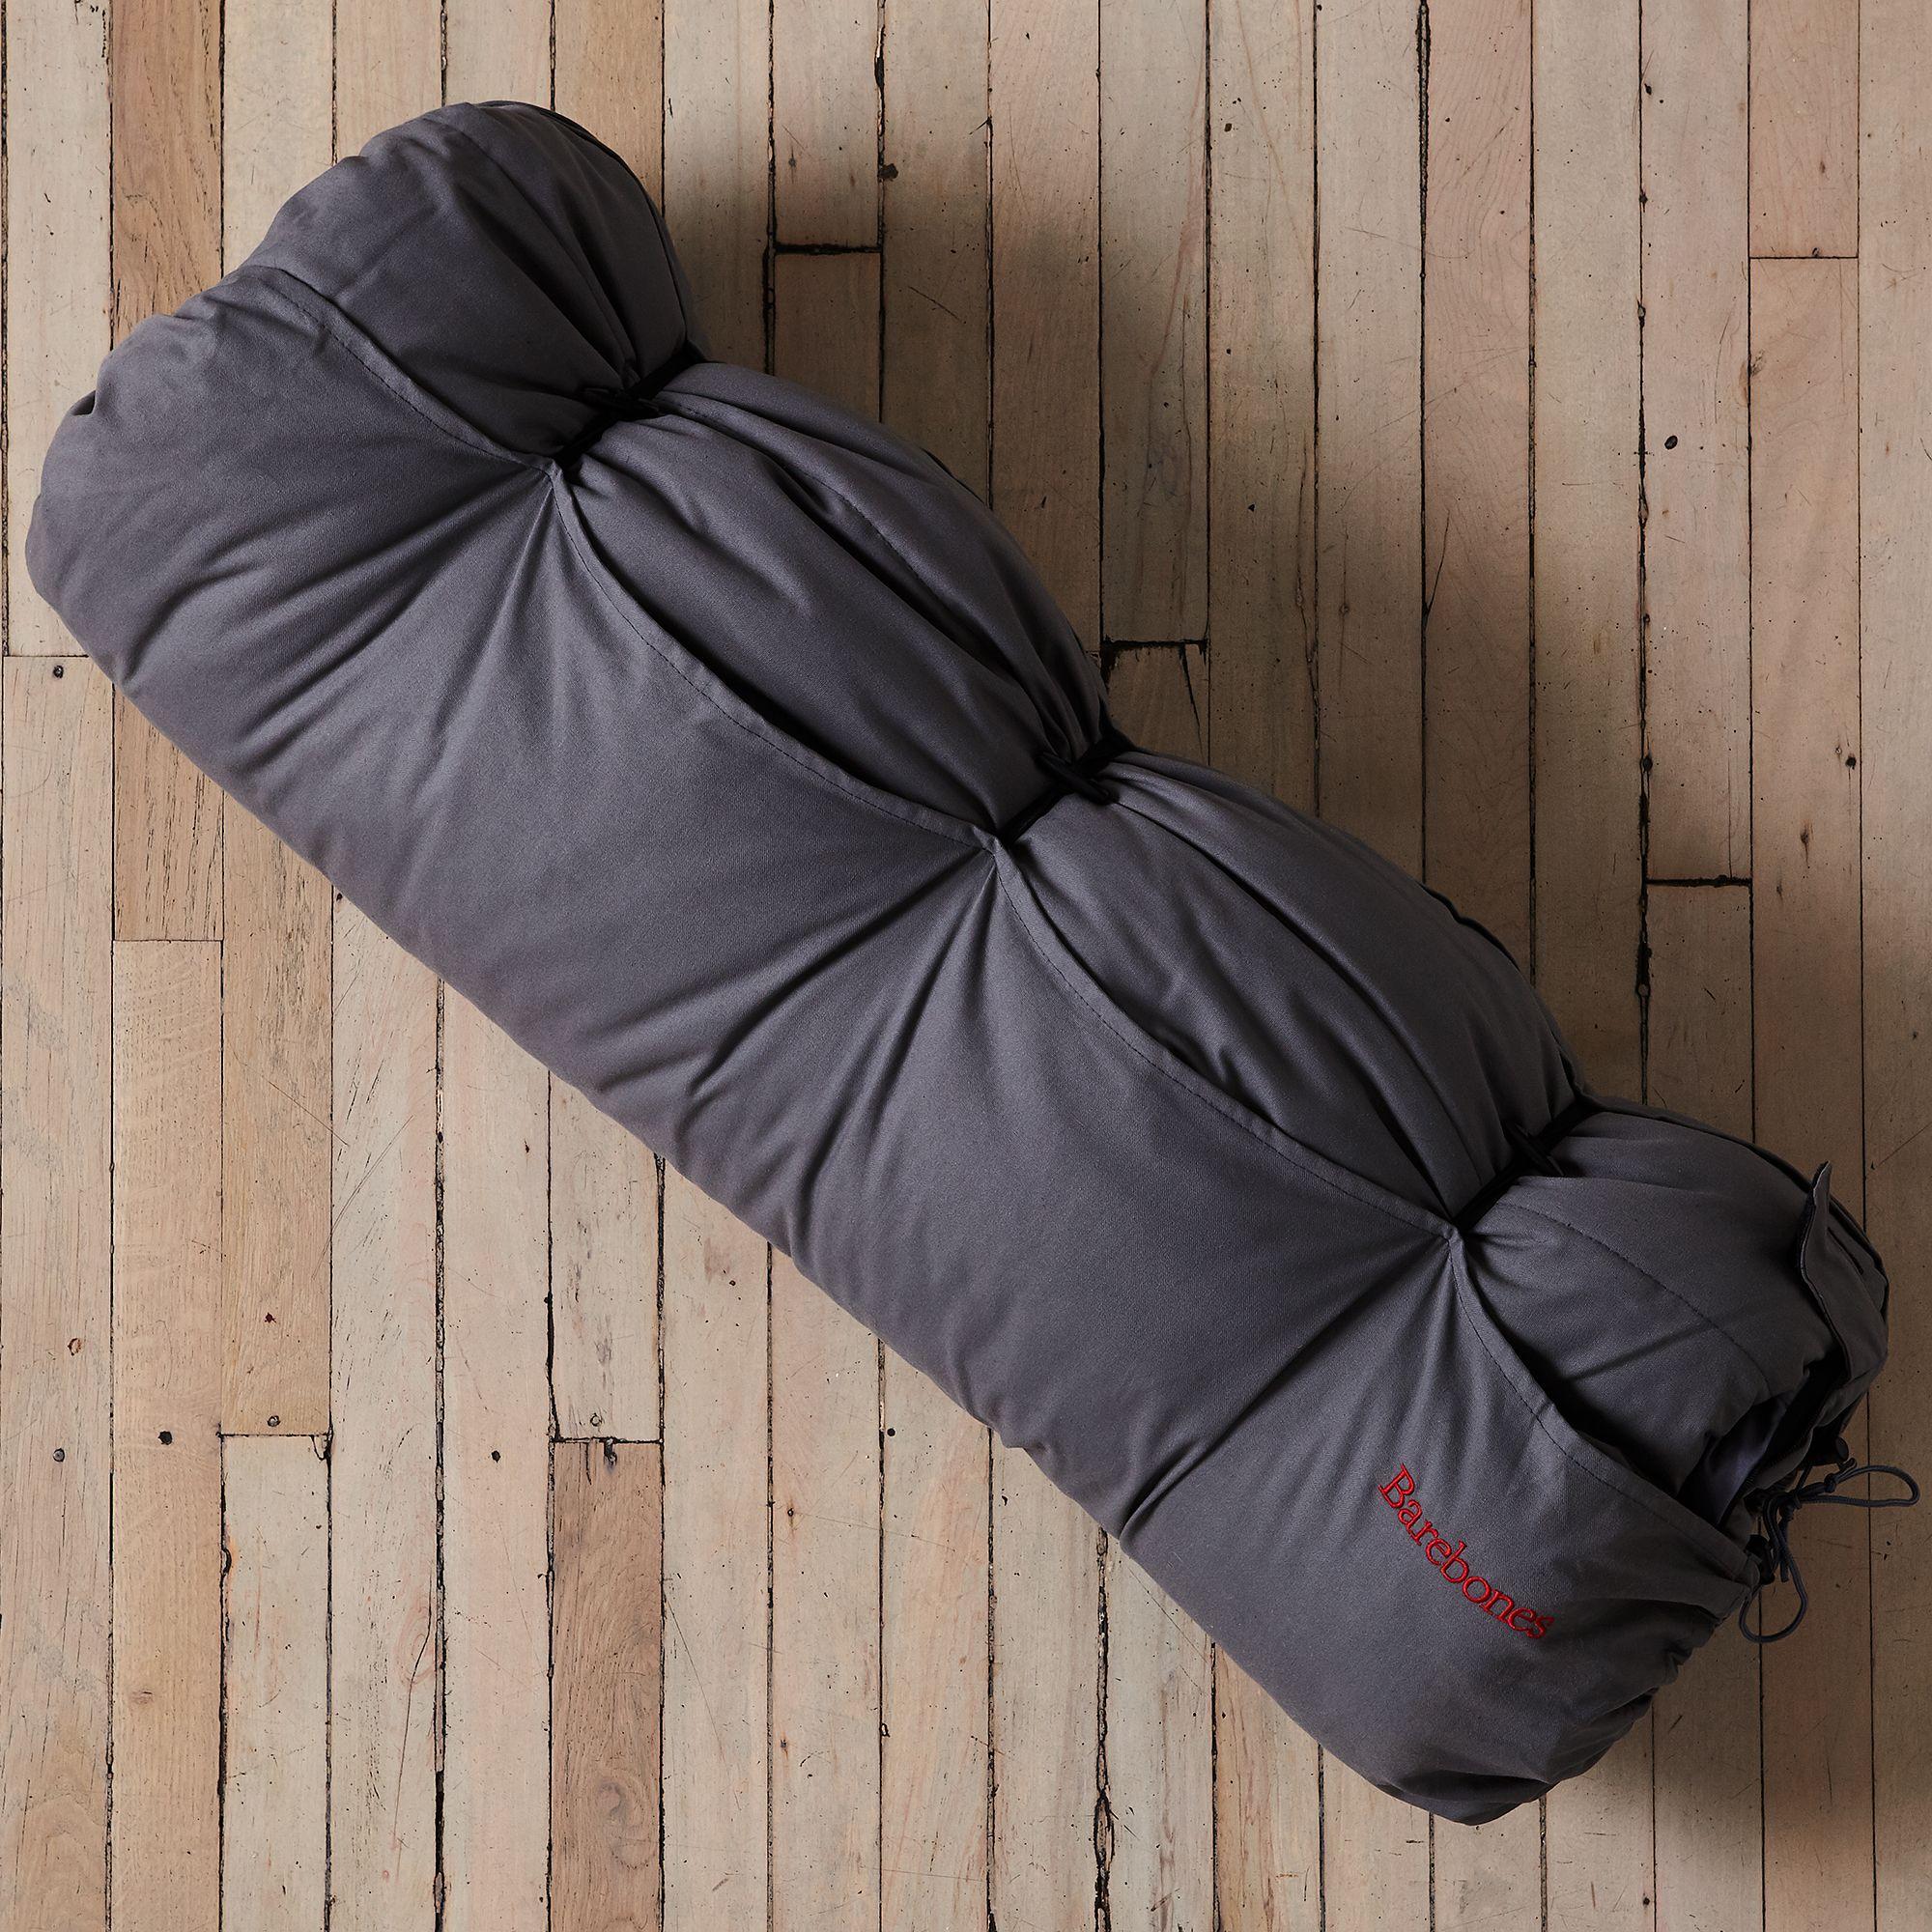 Children S Sleeping Bags The Best Bag Of 2018